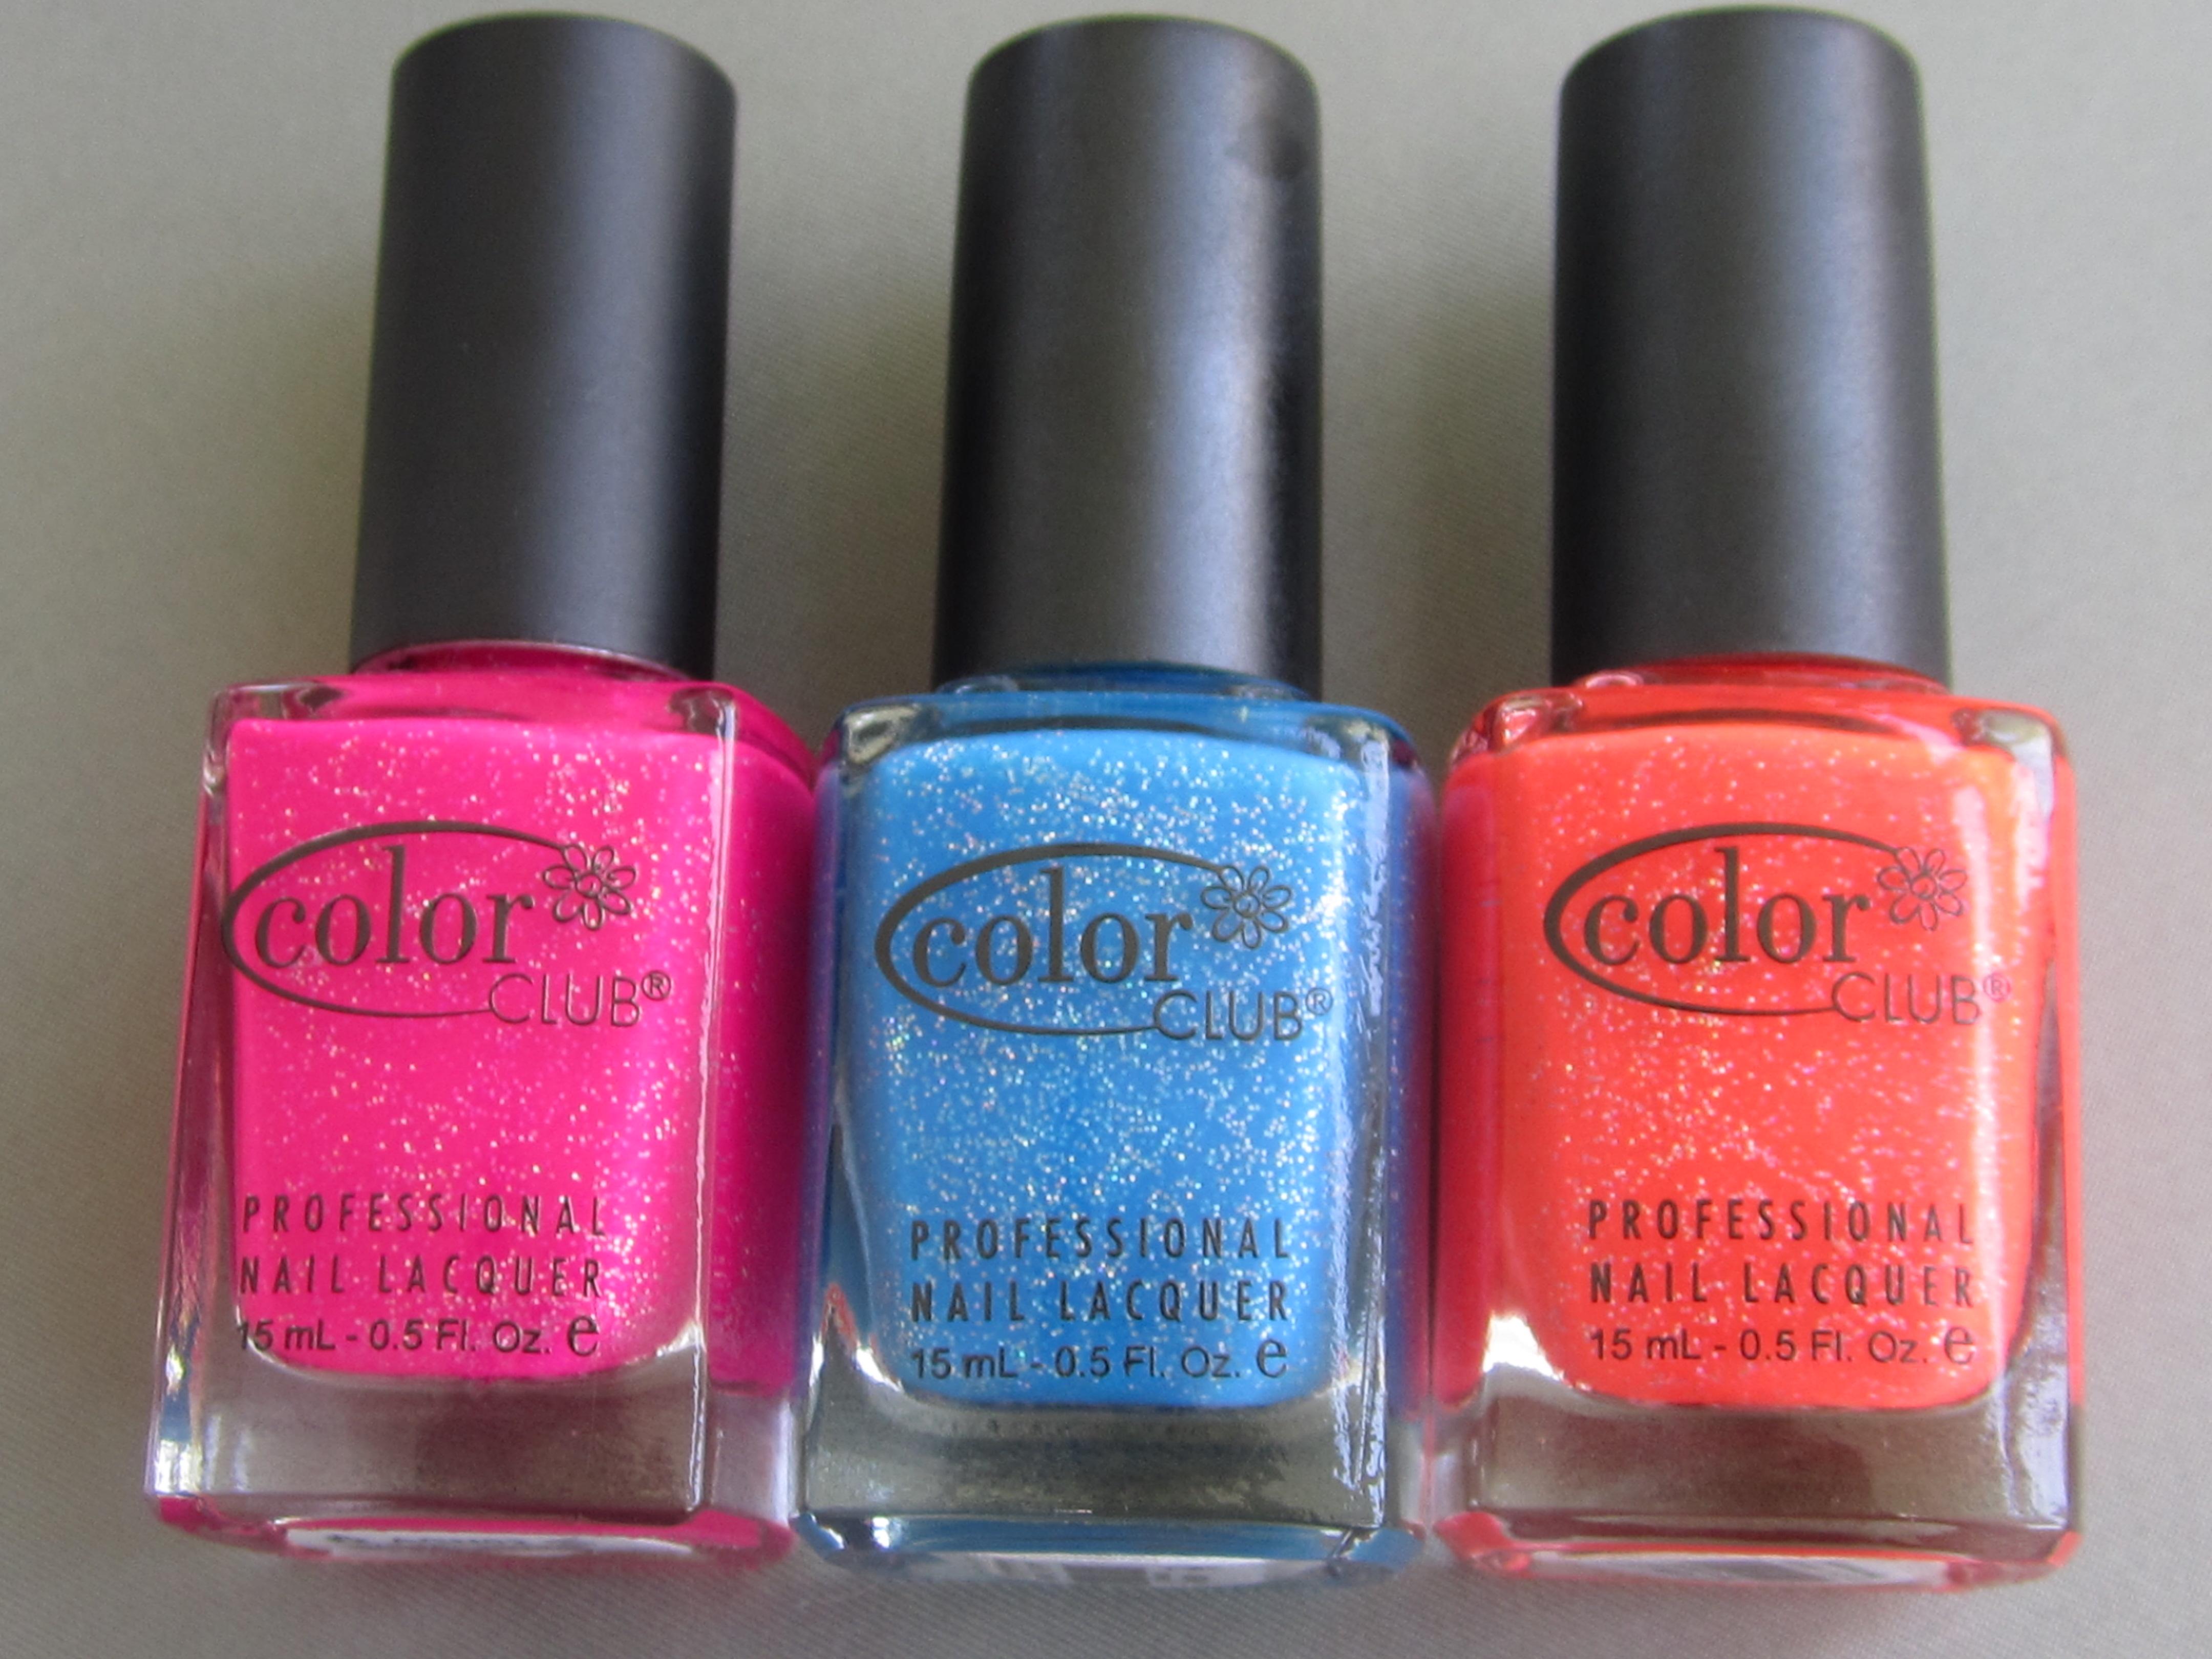 Color Club Nail Polish Haul ($3 a bottle)